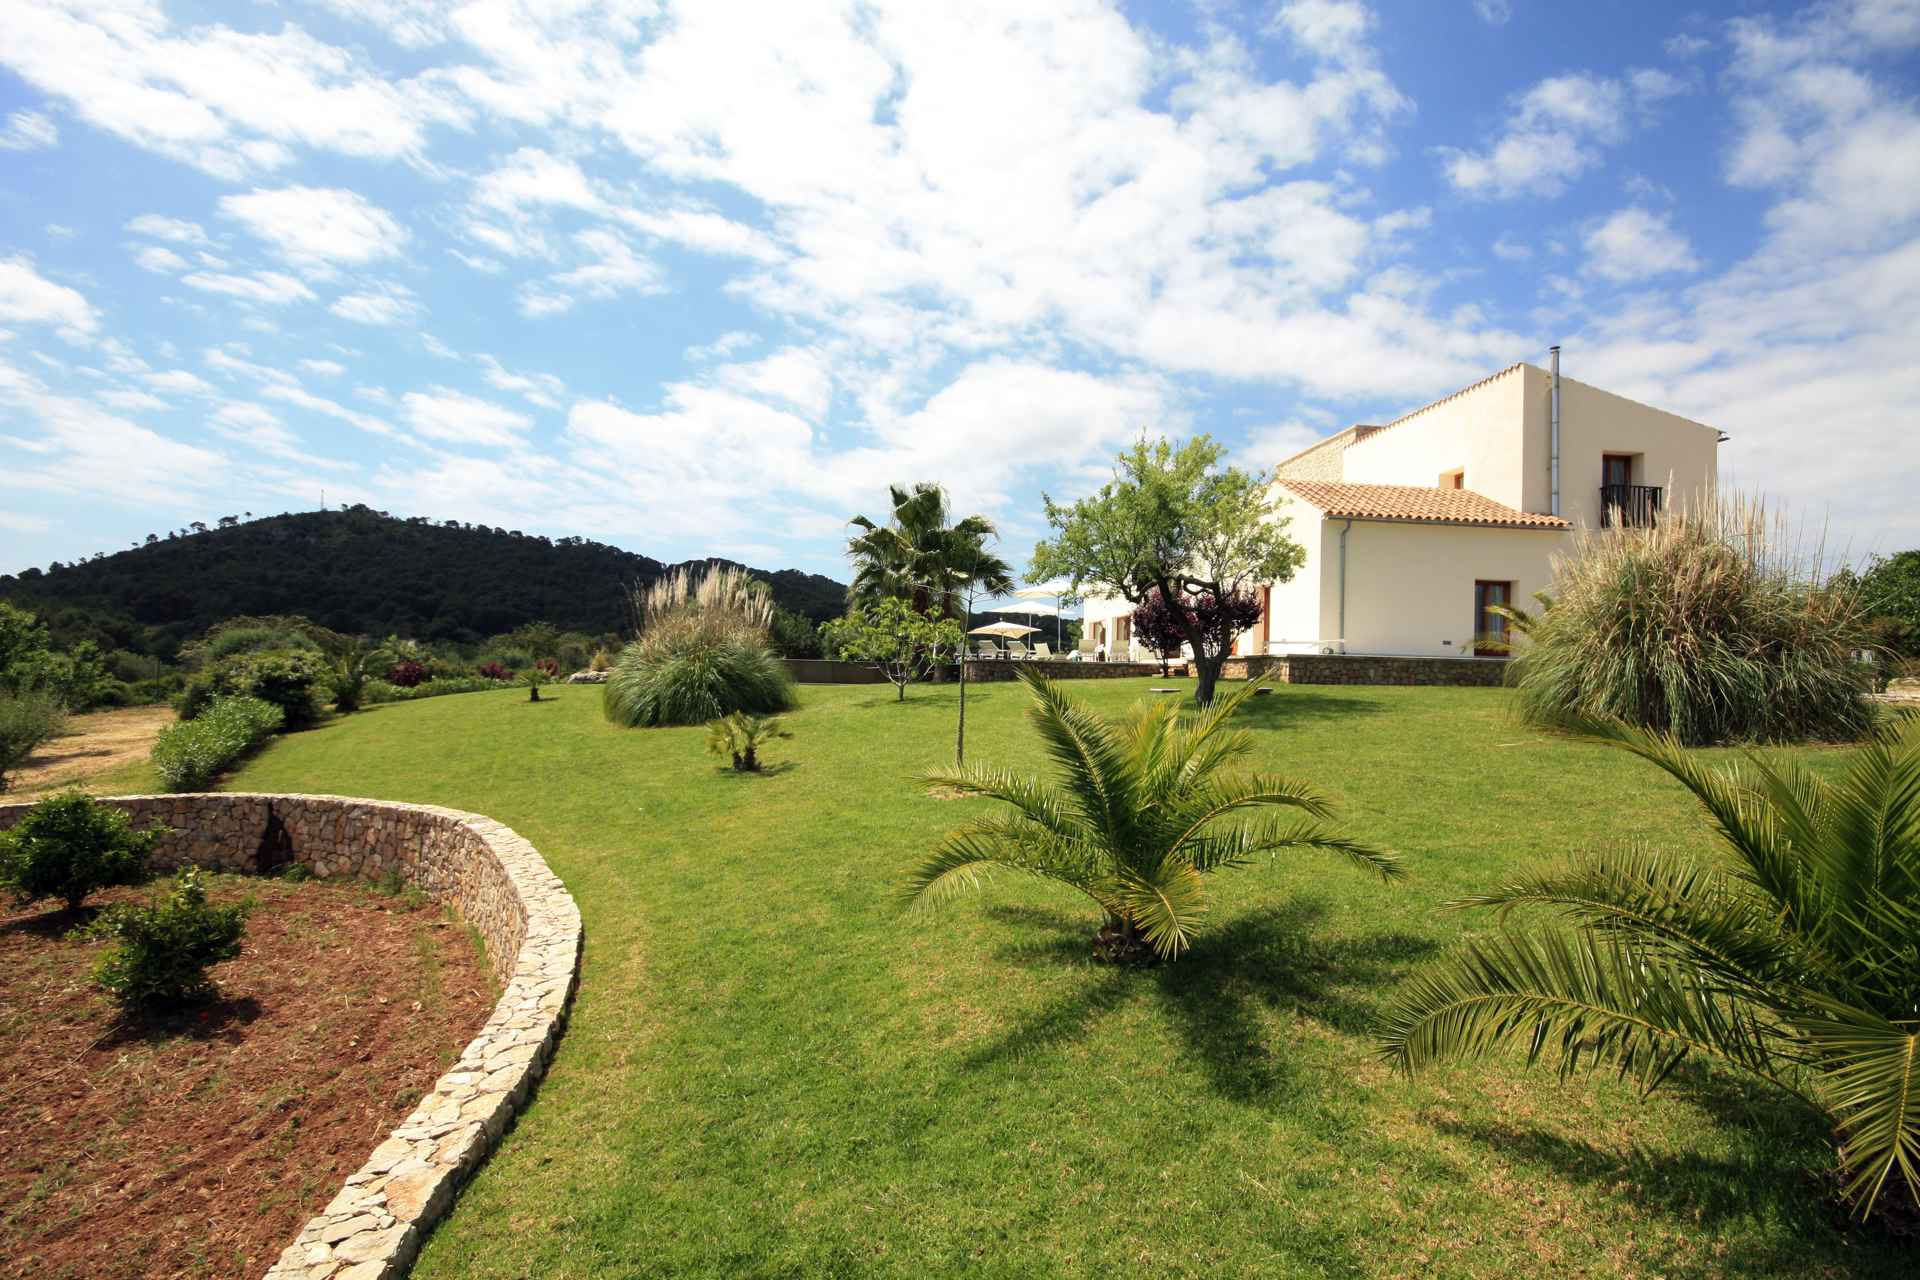 01-28 Luxus Finca Mallorca Nordosten Bild 4